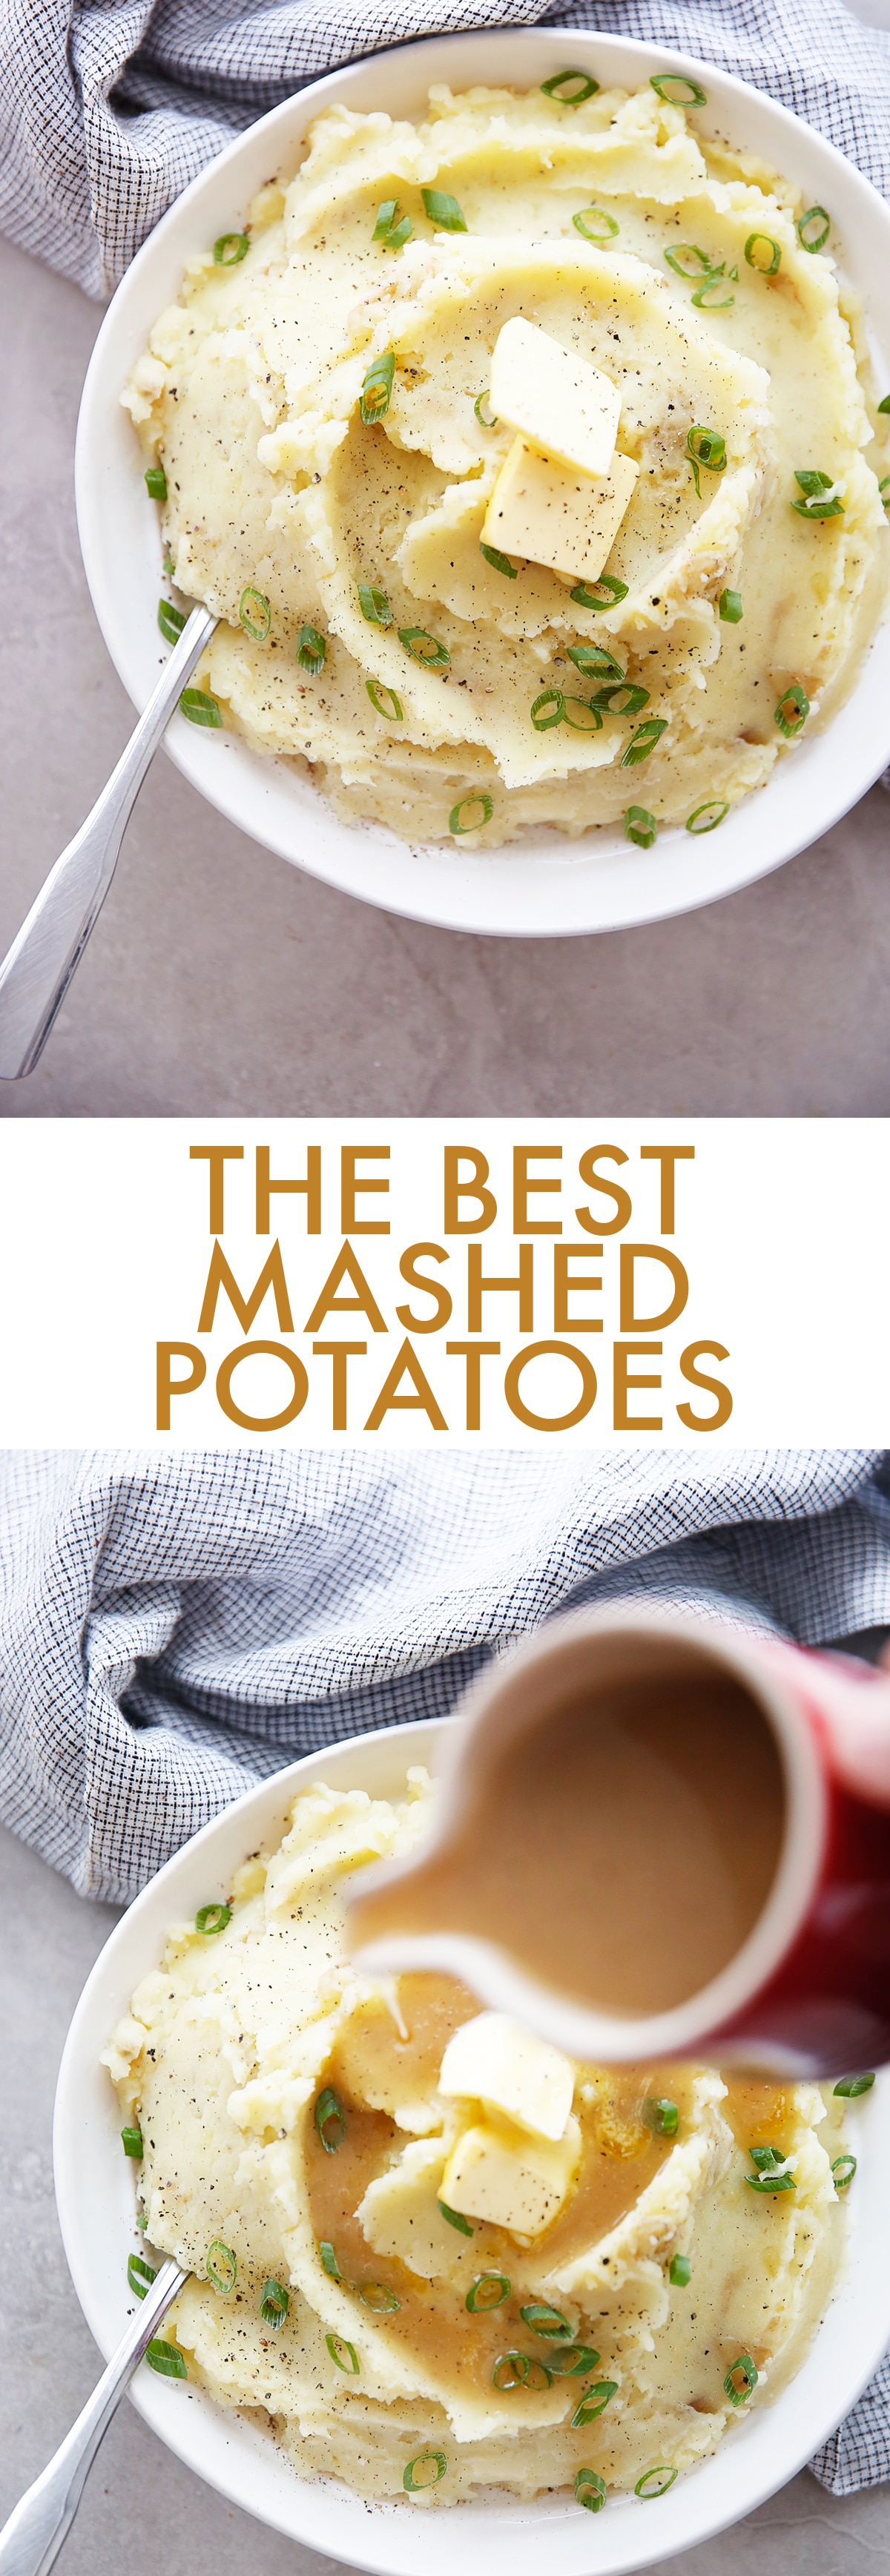 Lexi S Clean Kitchen Dairy Free Mashed Potatoes Paleo Vegan